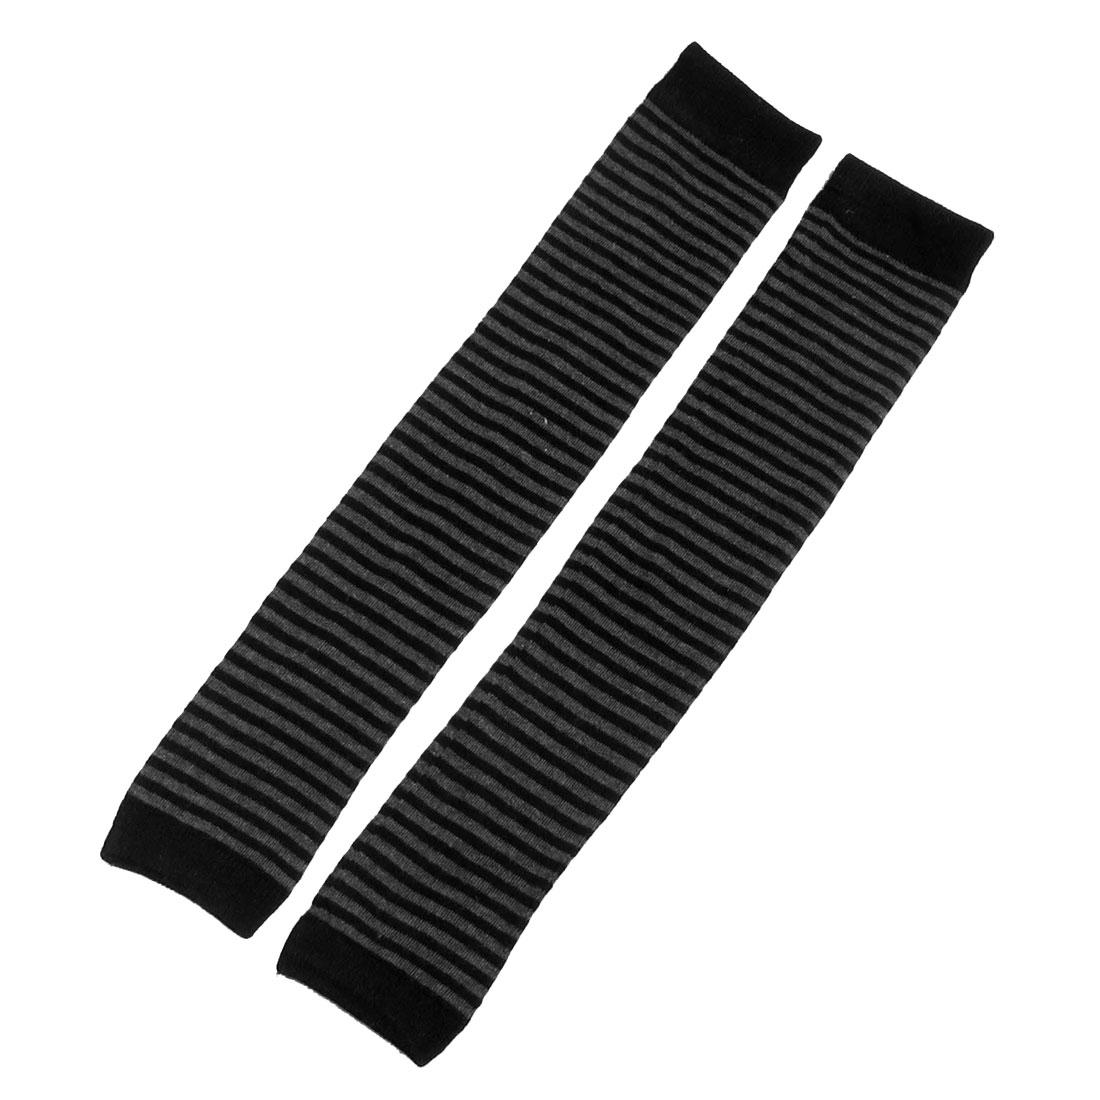 Black Gray Striped Pattern Knitting Winter Toeless Leg Warmers Stockings for Women